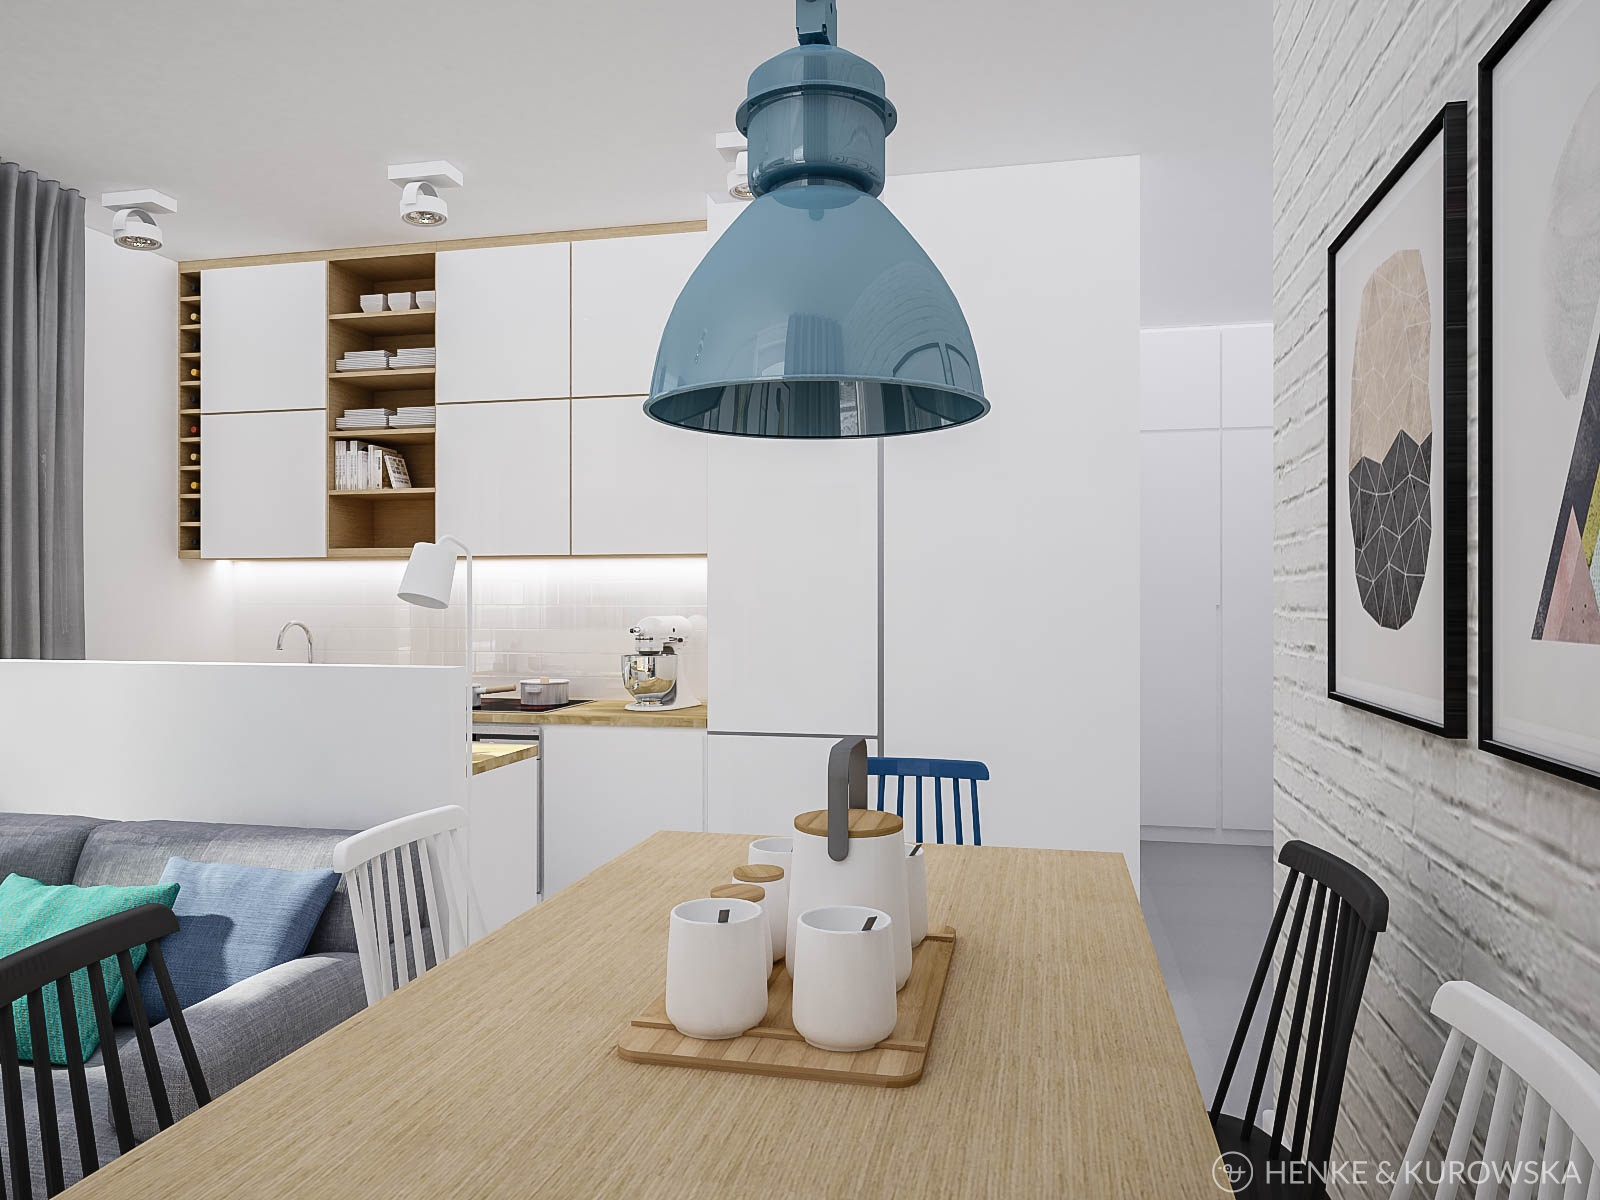 Henke kurowska studio projektowe projekt mieszkania 50m2 for Wohnlandschaft 2 50 m